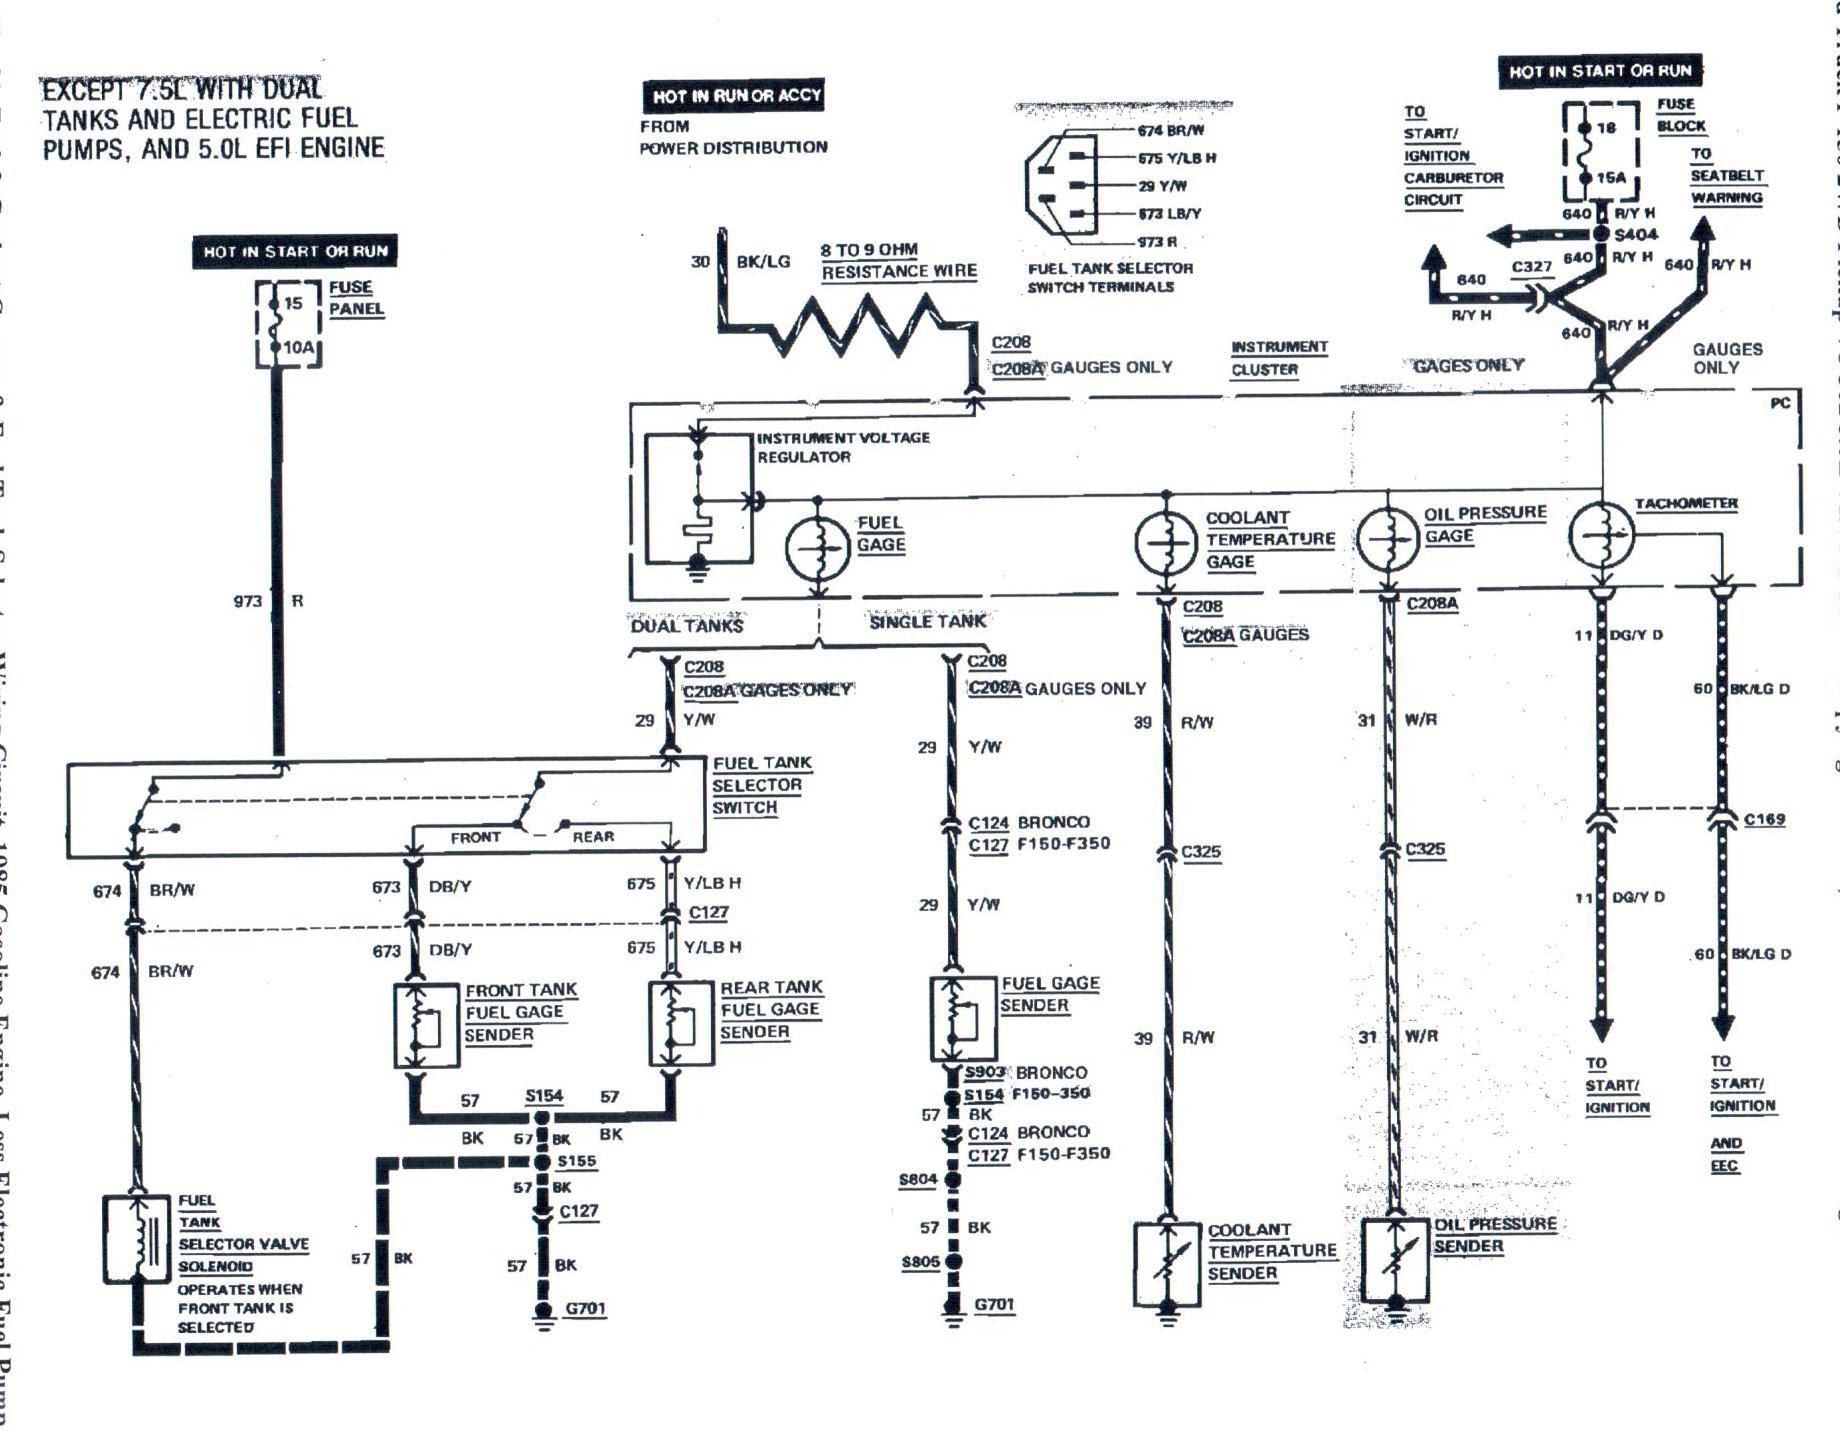 1985 f150 fuel problem please help fordforumsonline com rh fordforumsonline com